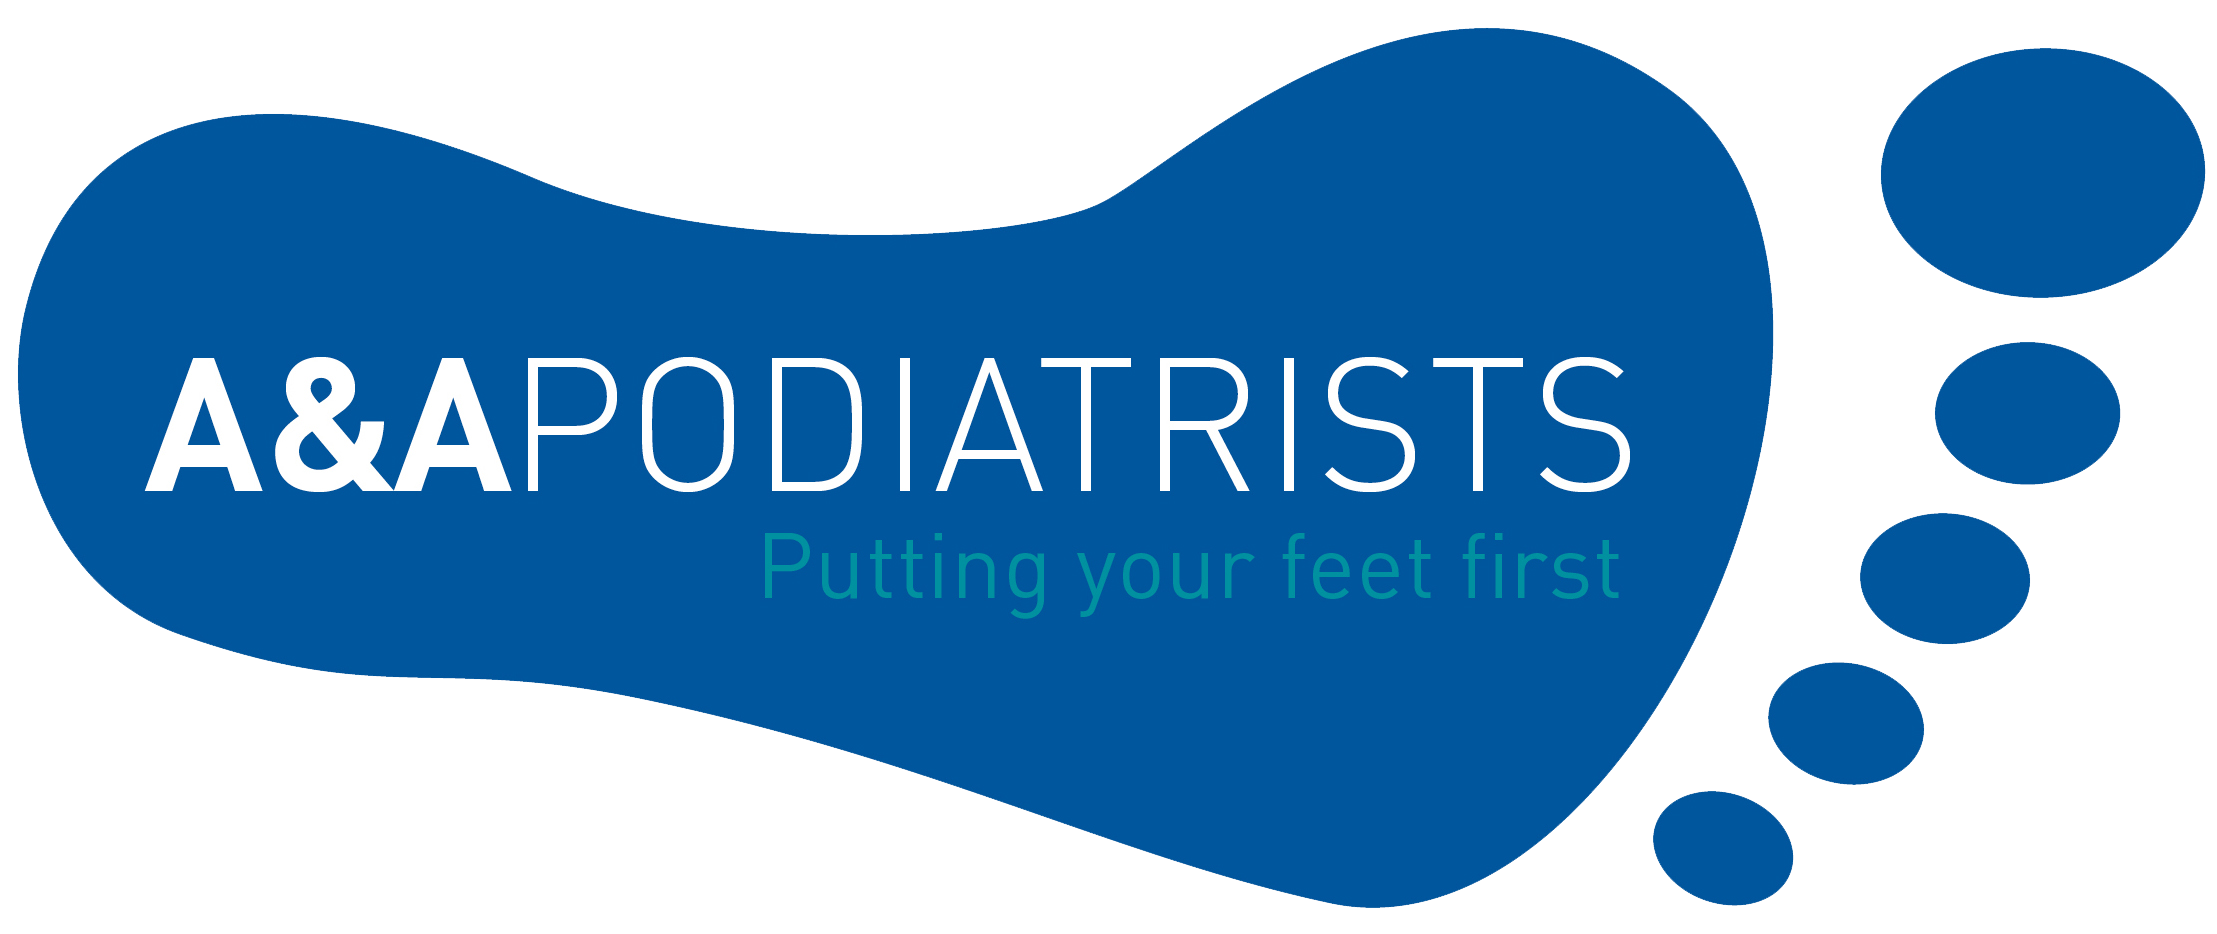 Aa Podiatrists Chiropodists Podiatry And Foot Health